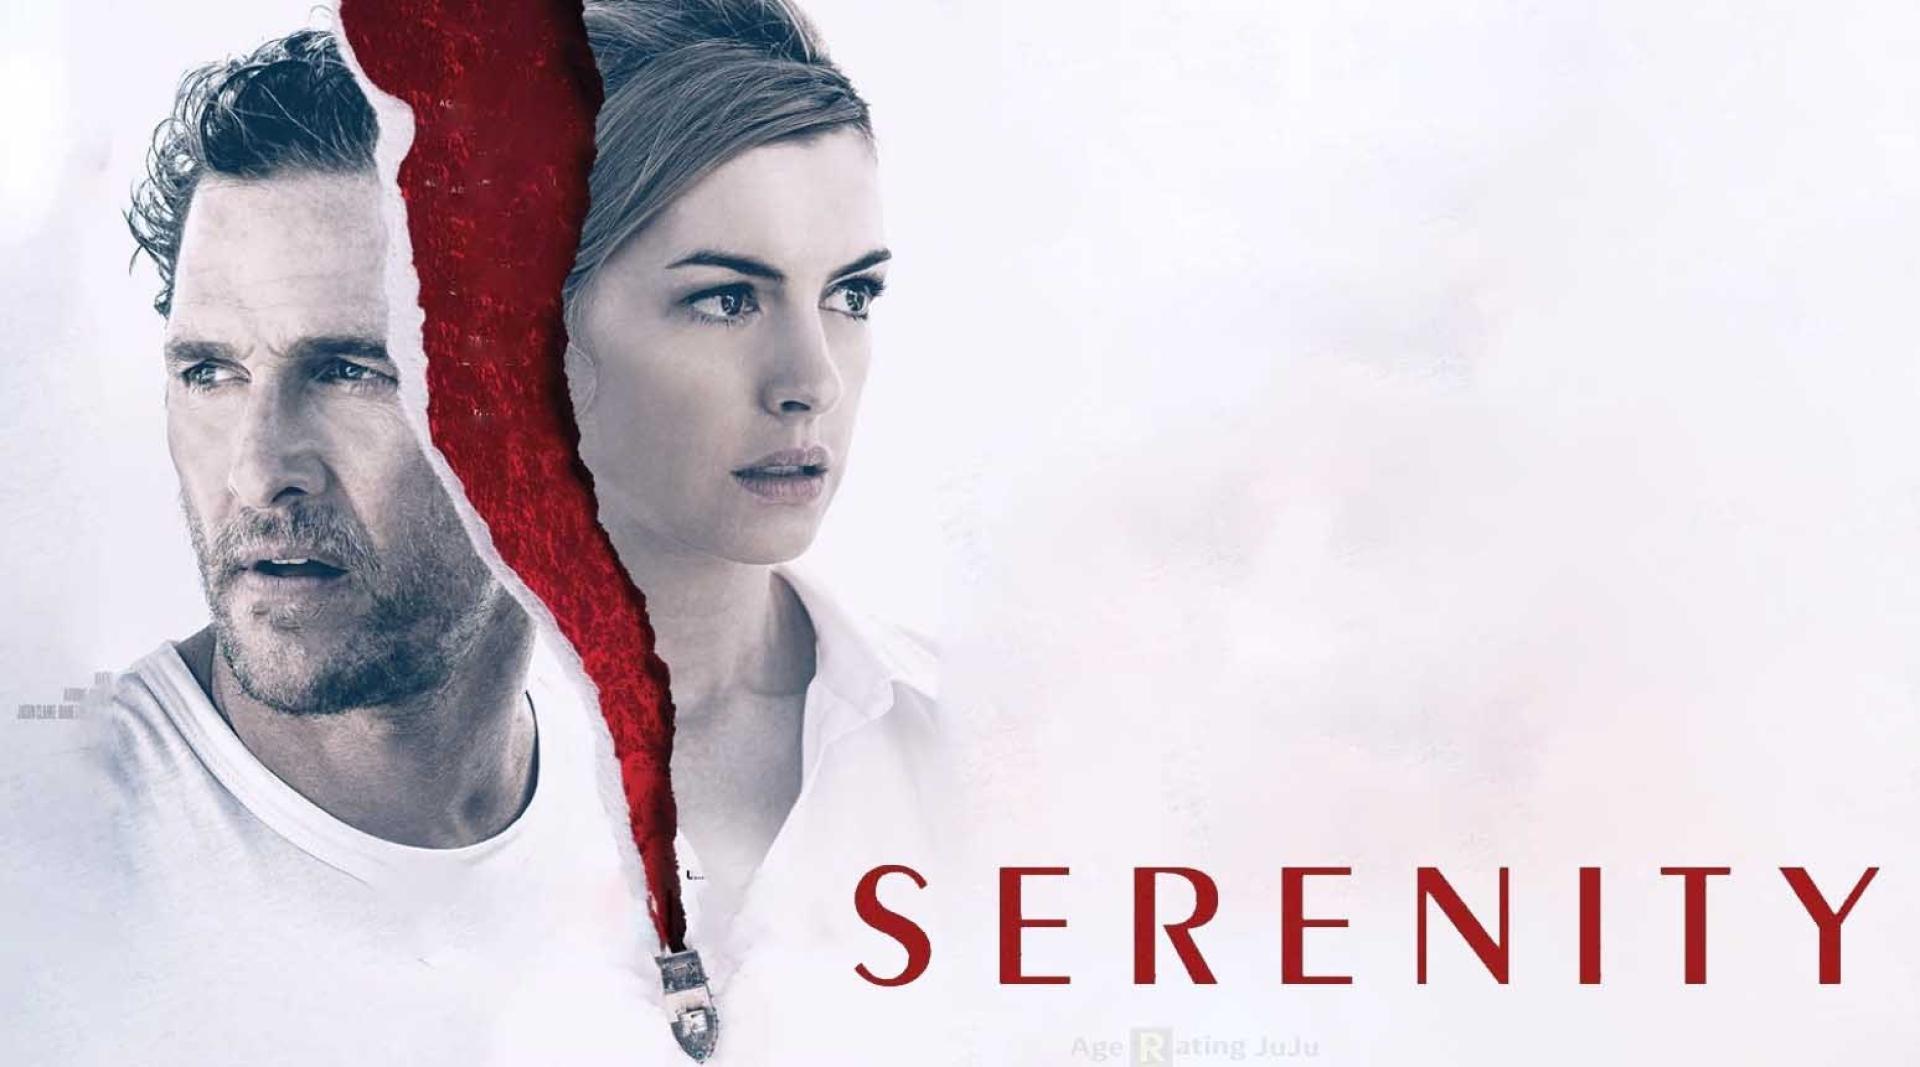 Serenity - Vihar előtt (2019)